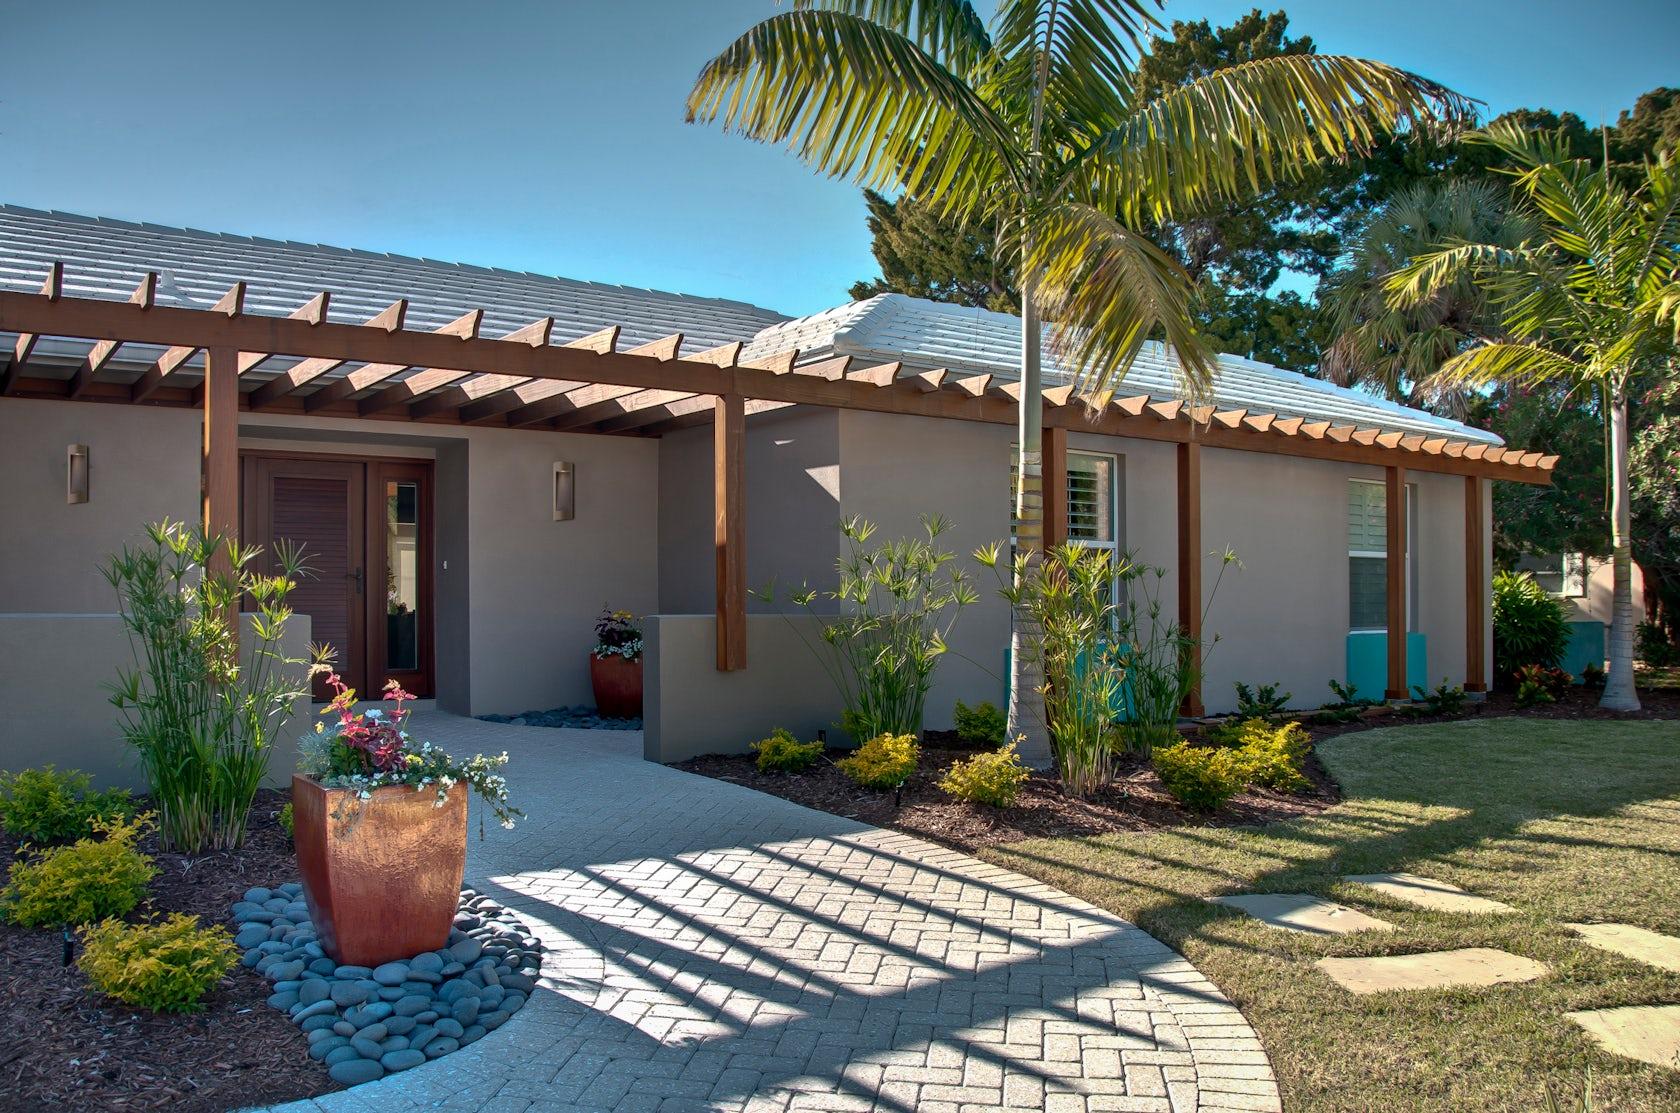 Florida Ranch Exterior Renovation Architizer